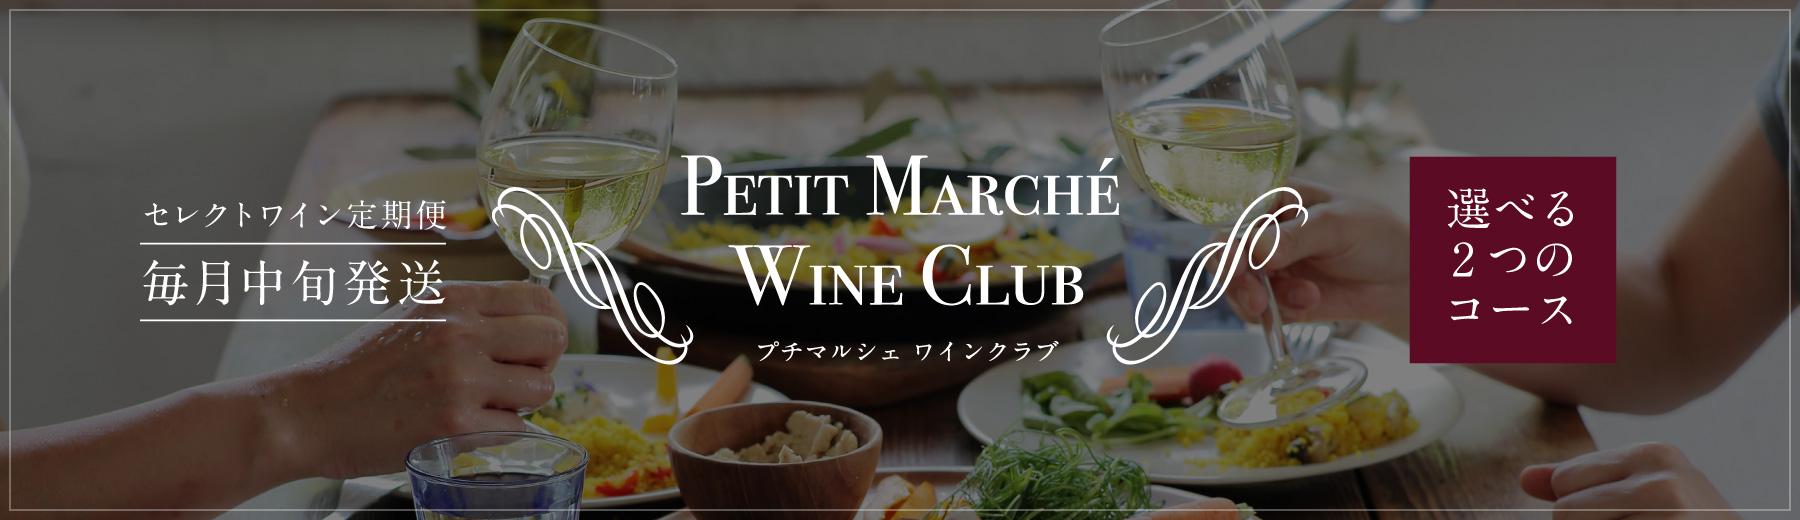 Petit Marche Wine Club